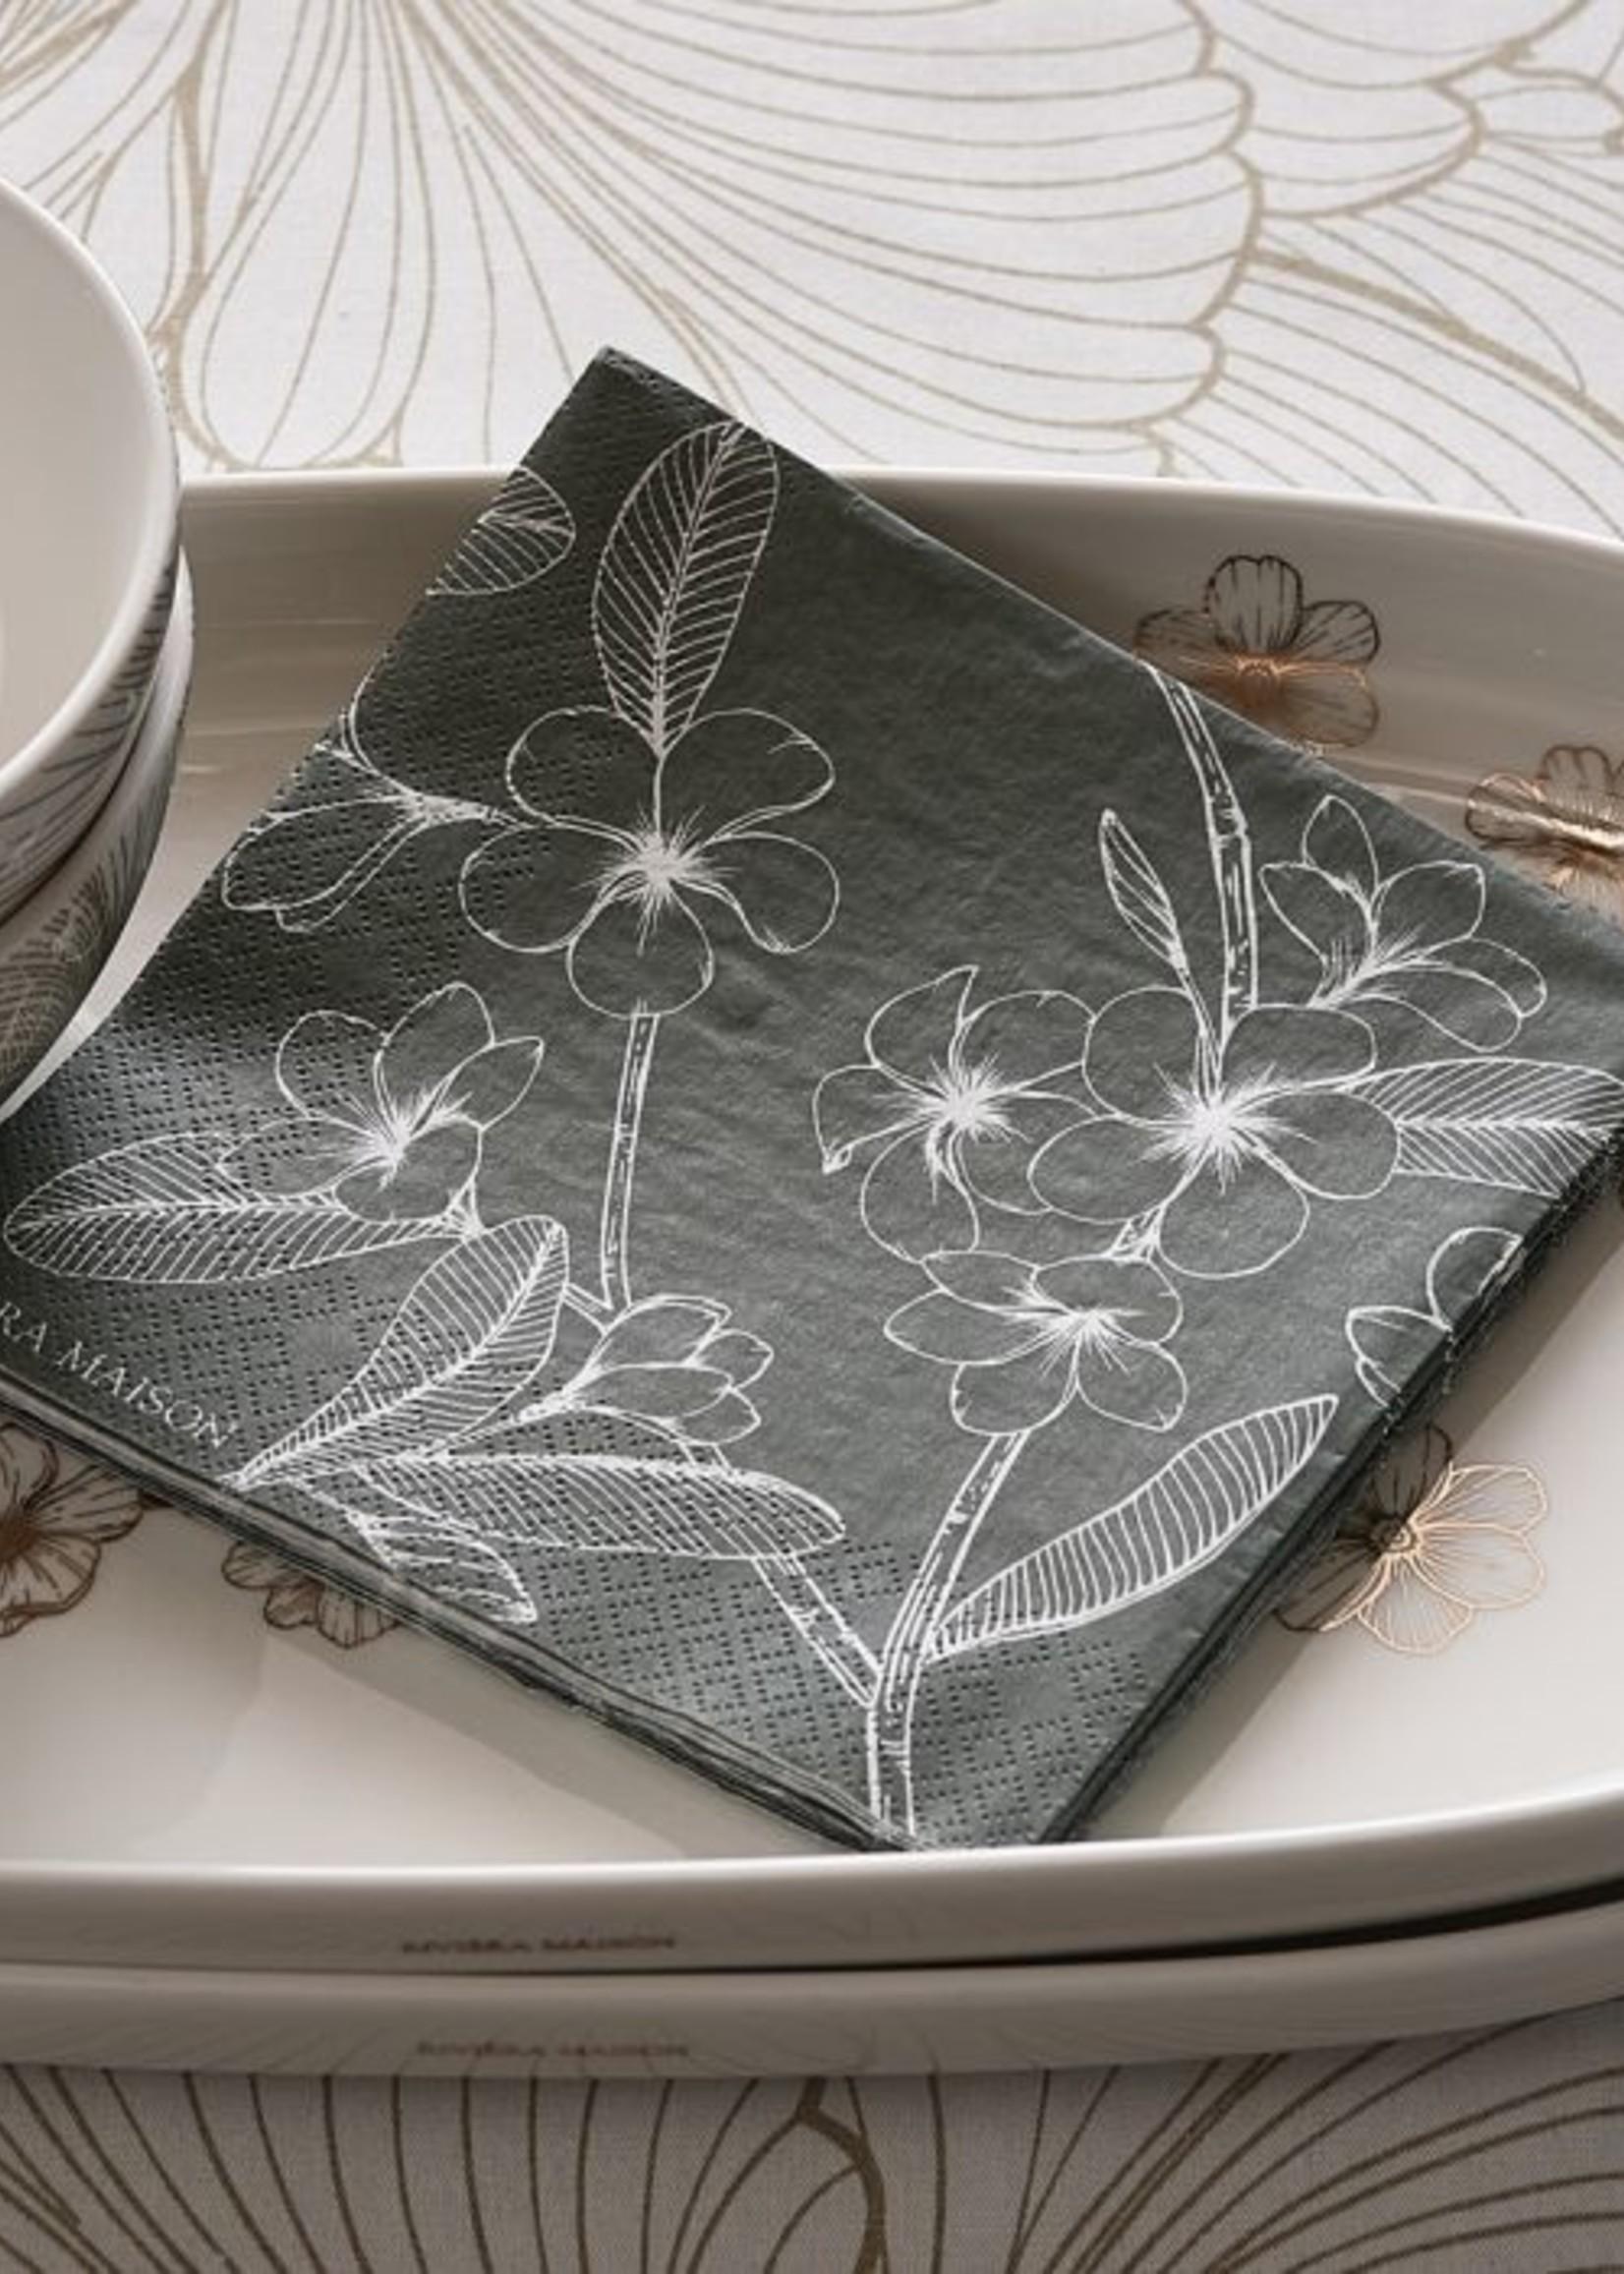 Riviera Maison Paper Napkin Wild Flowers